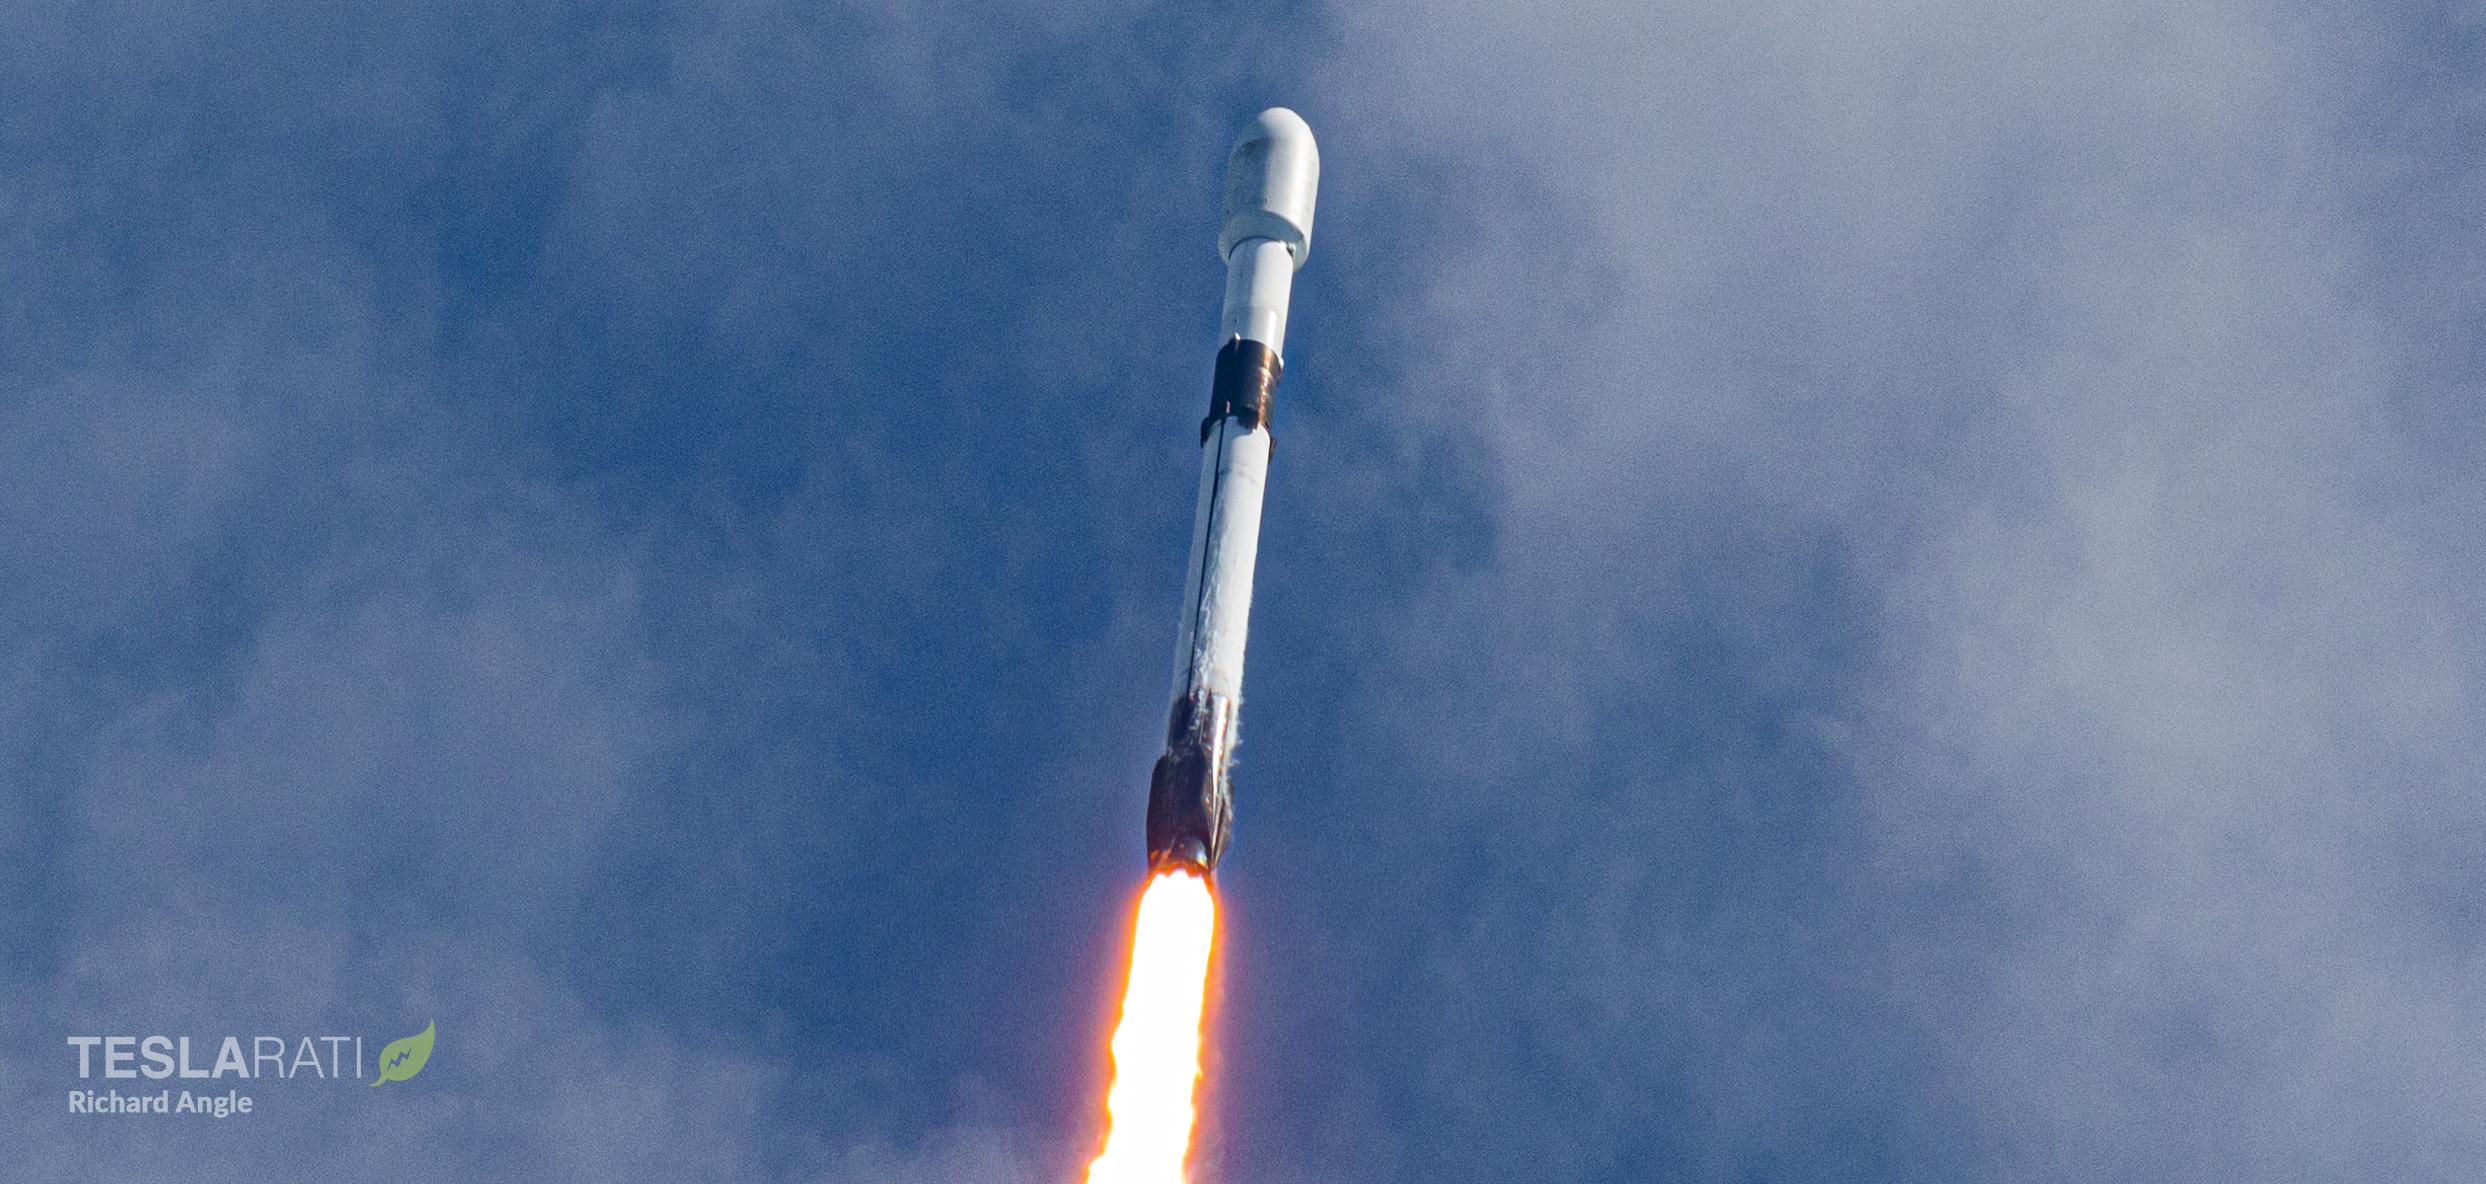 Starlink-10 SkySat Falcon 9 B1049 081820 (Richard Angle) launch 4 crop